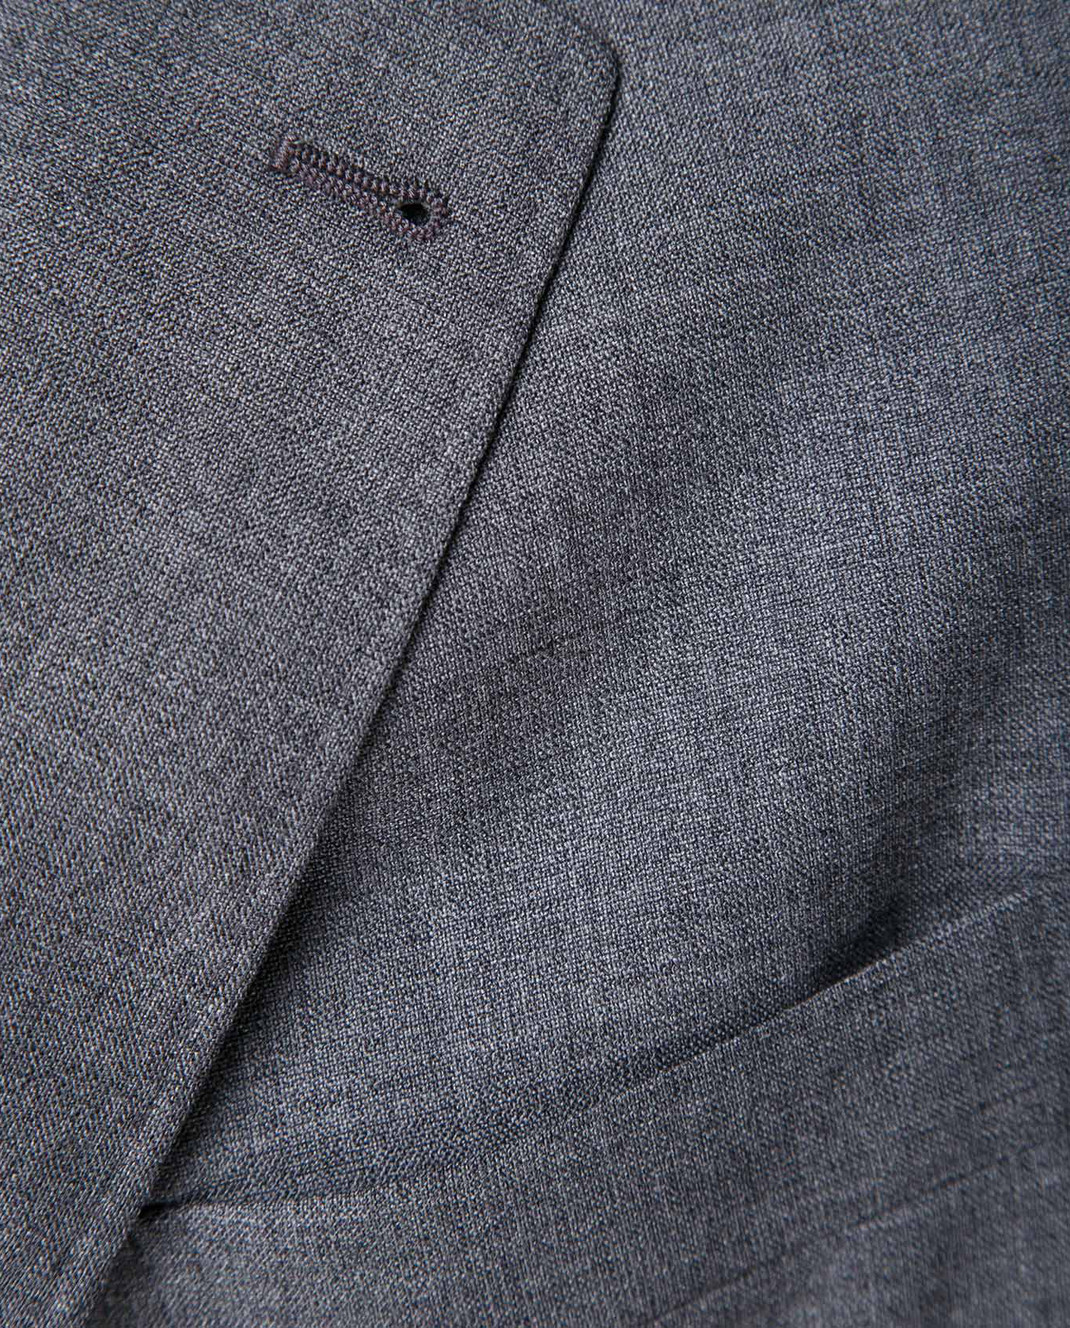 Brunello Cucinelli Серый пиджак из шерсти MF4237BTD изображение 5